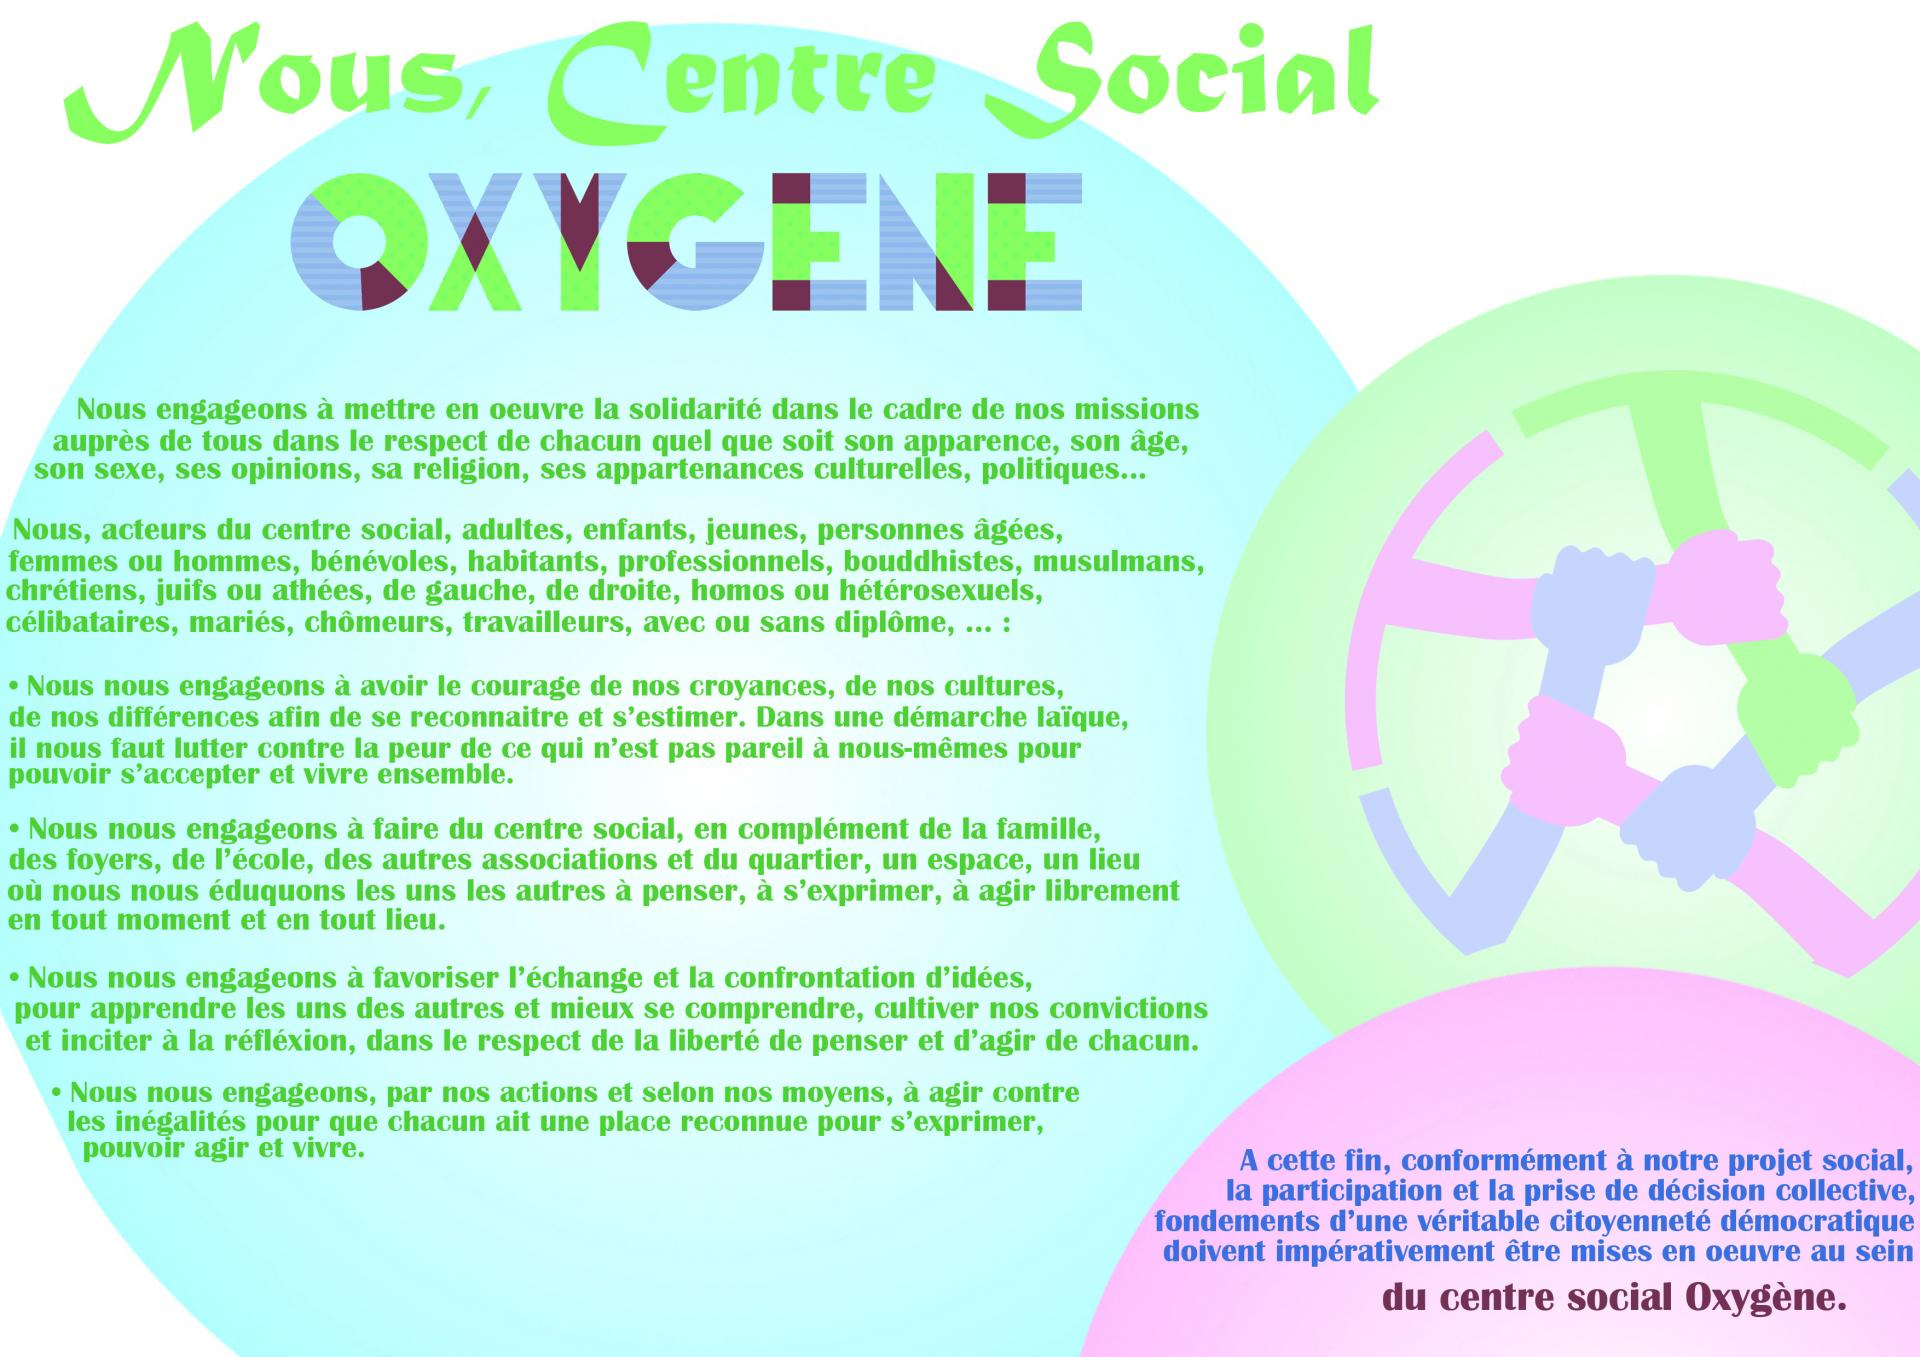 Charte oxygene